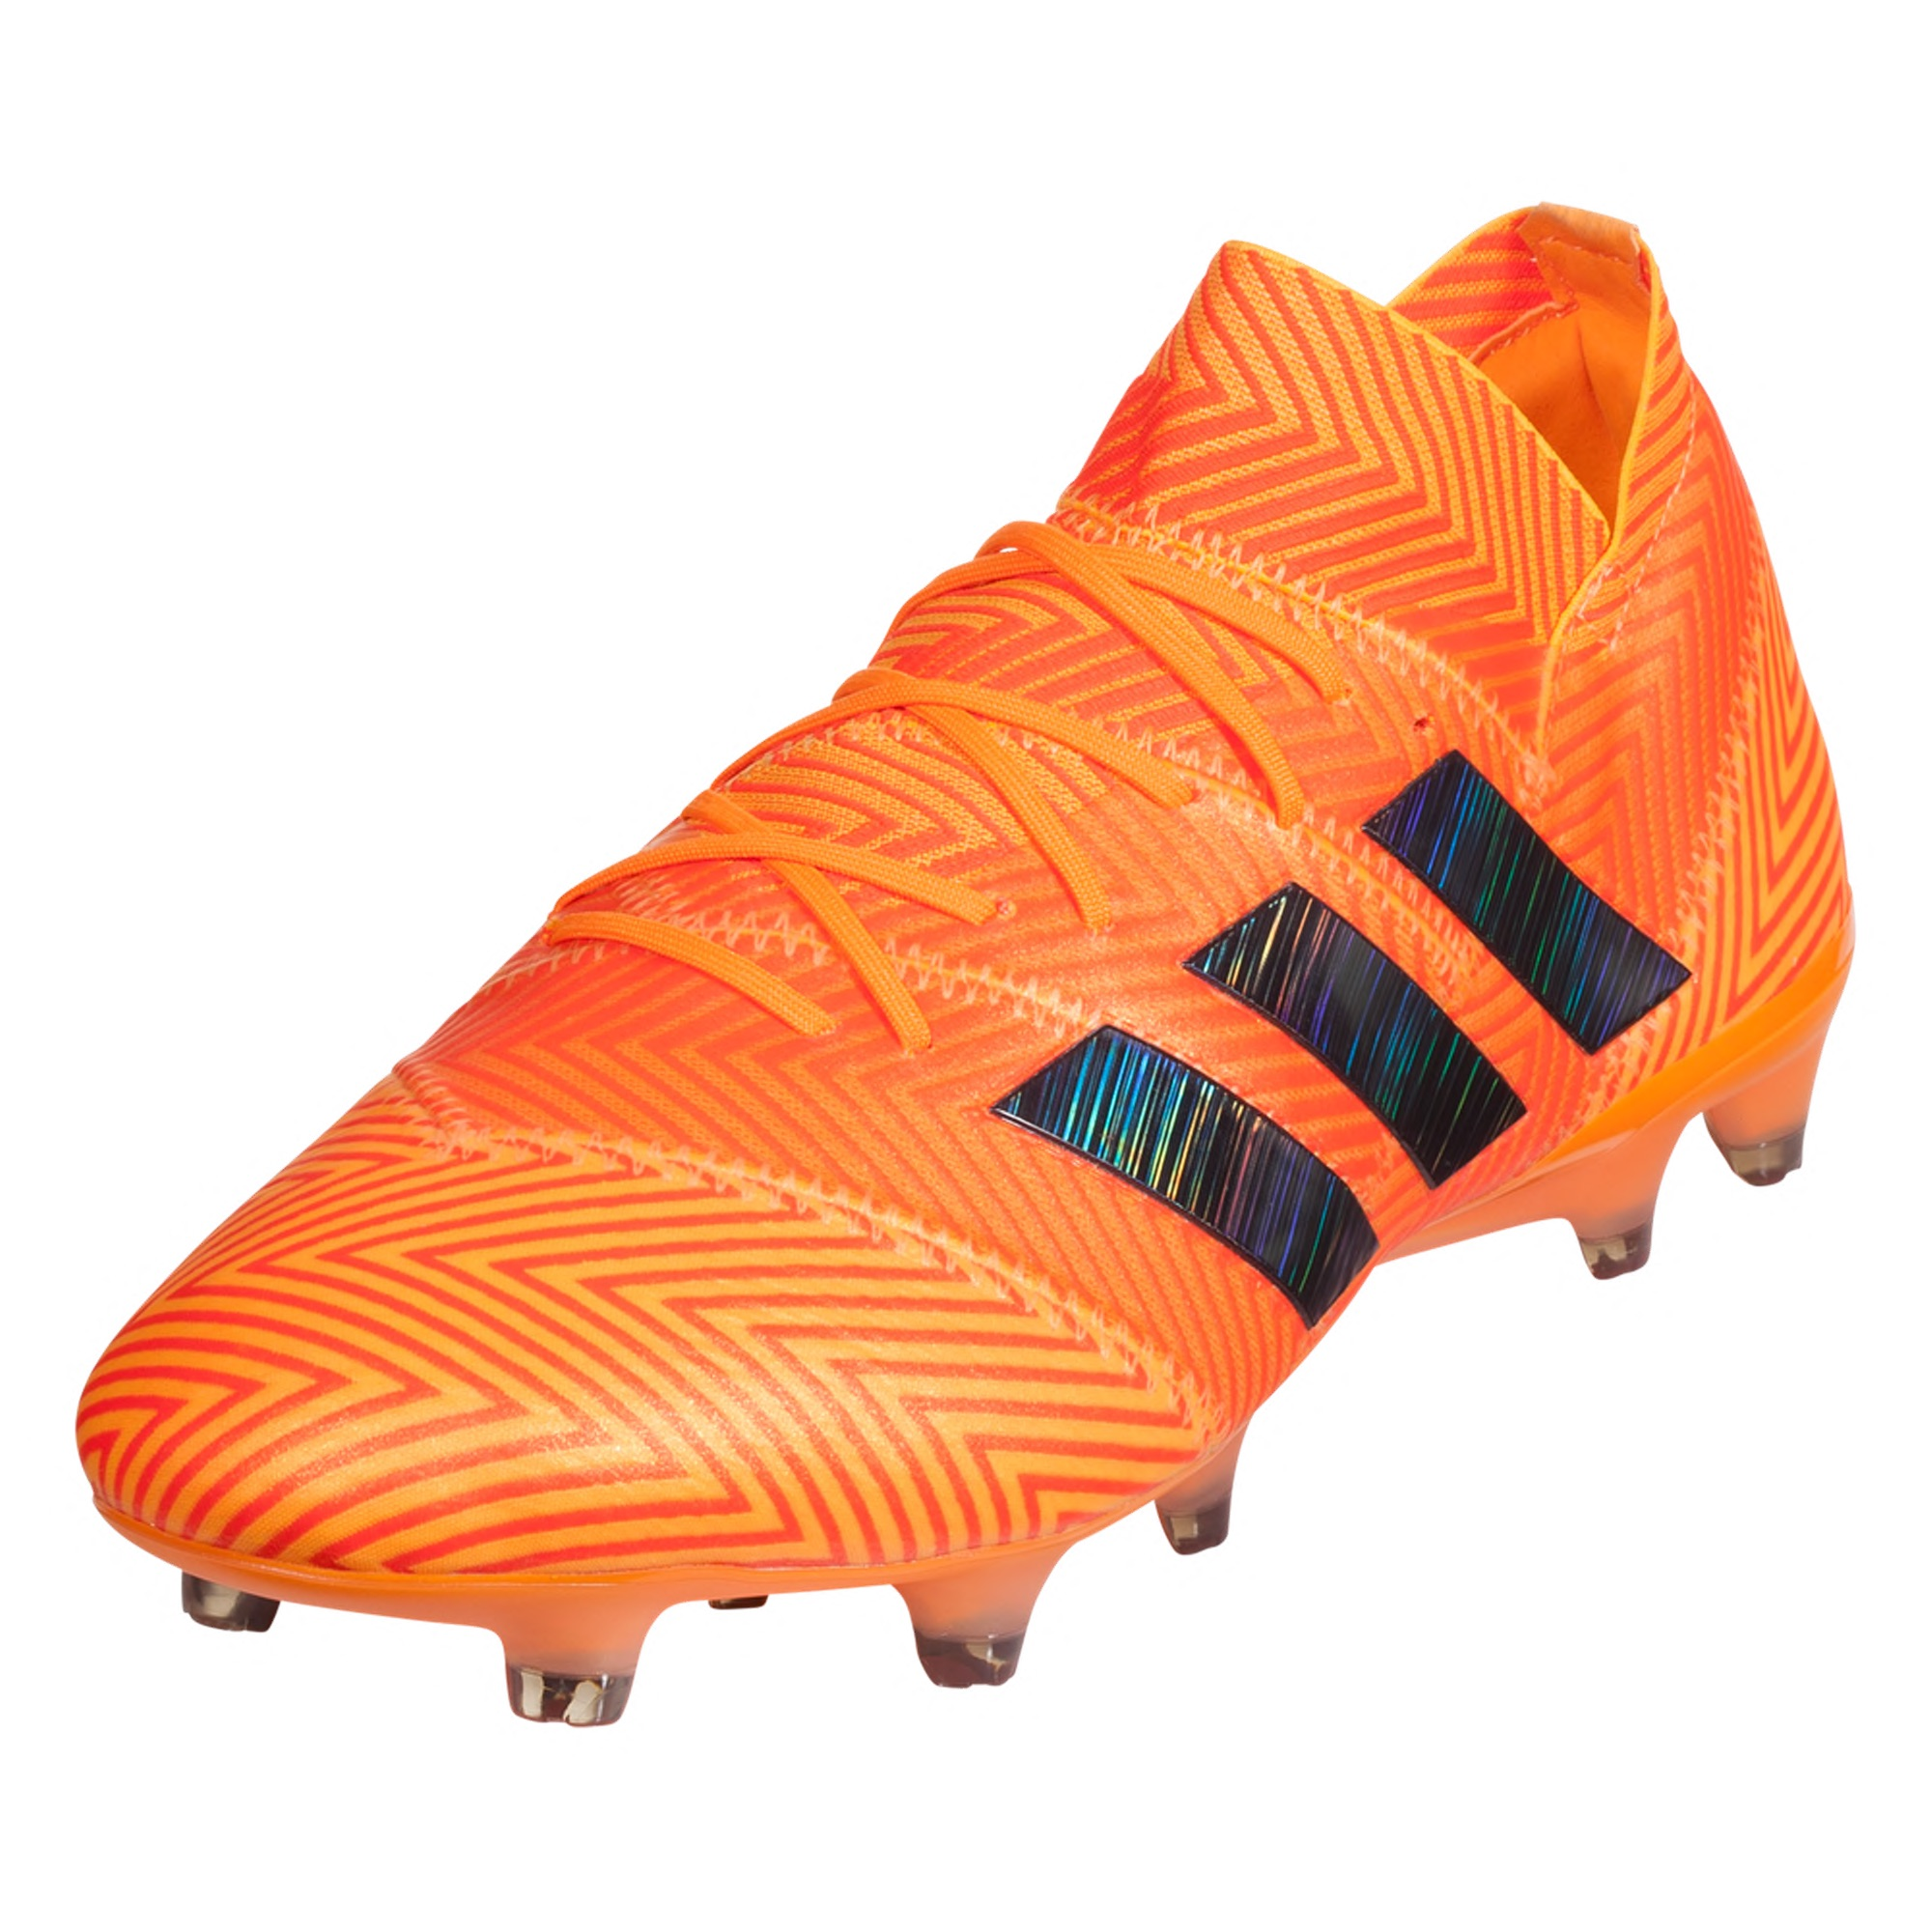 44261694b664 adidas Nemeziz 18.1 FG Soccer Cleats – Zest/Core Black/Solar Red ...